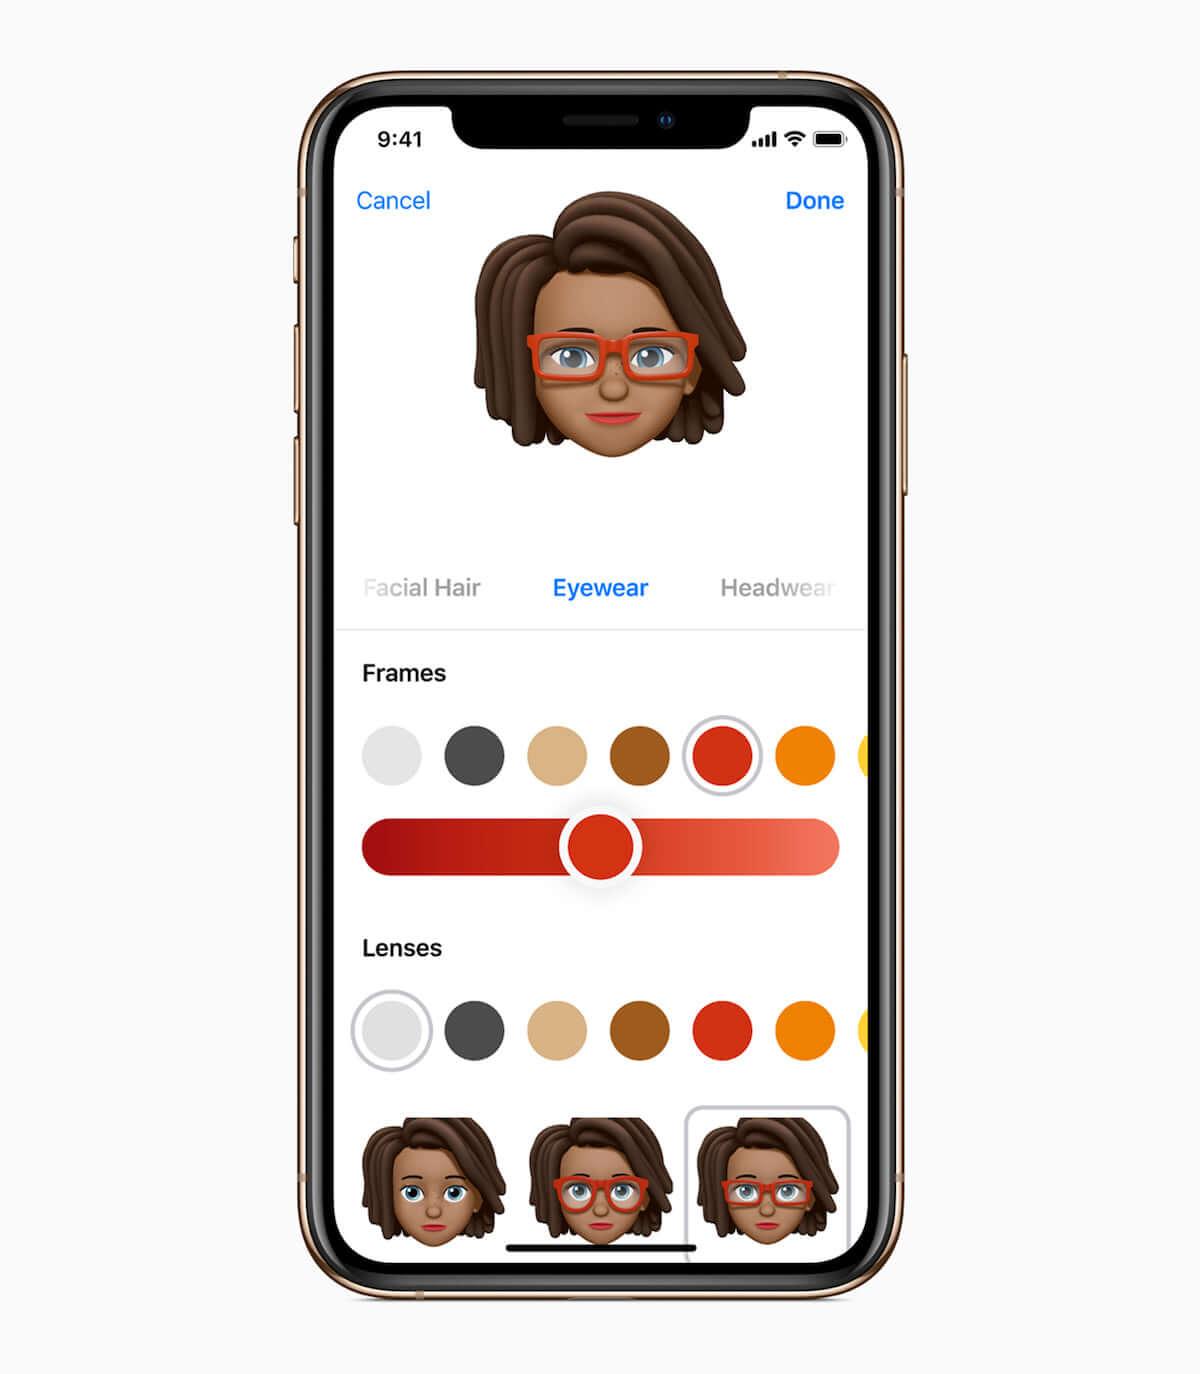 iOS 12登場 動作高速化、ミー文字など新機能追加!iPhone 5s/iPhone SE以降をサポート technology180916_ios-12_2-1200x1374